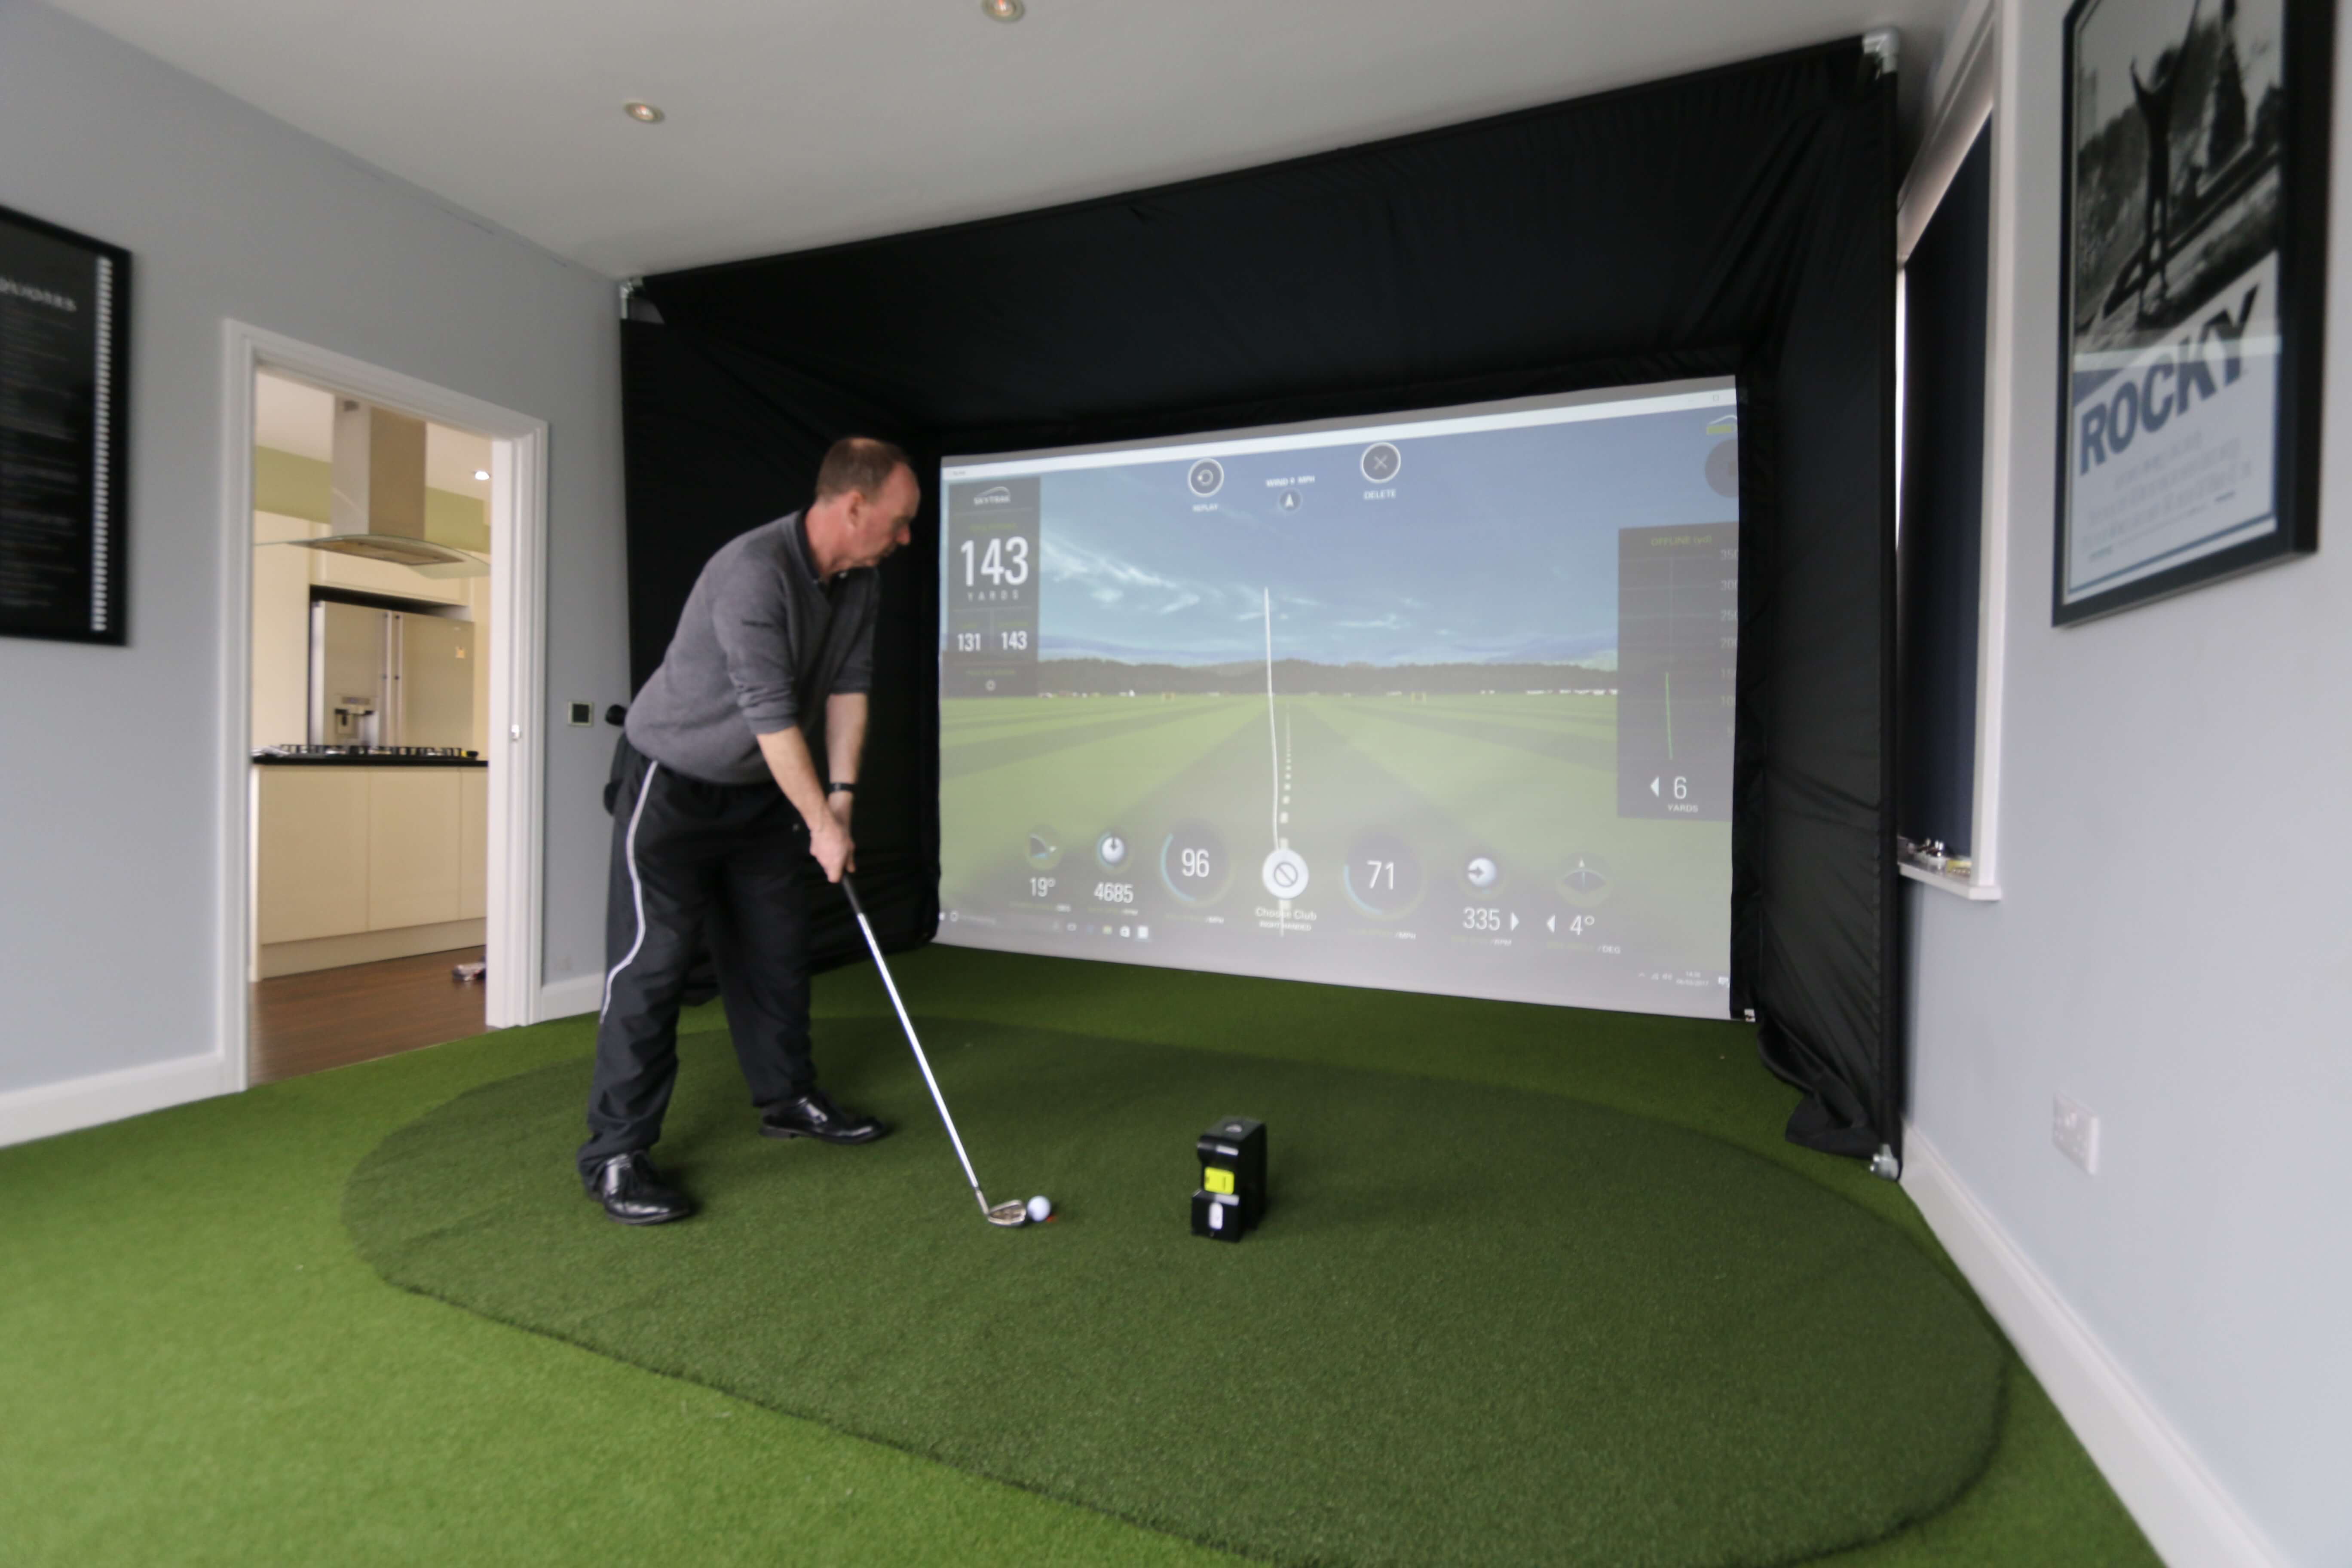 Skytrak full system golf simulator golf swing systems for Golf simulator room dimensions